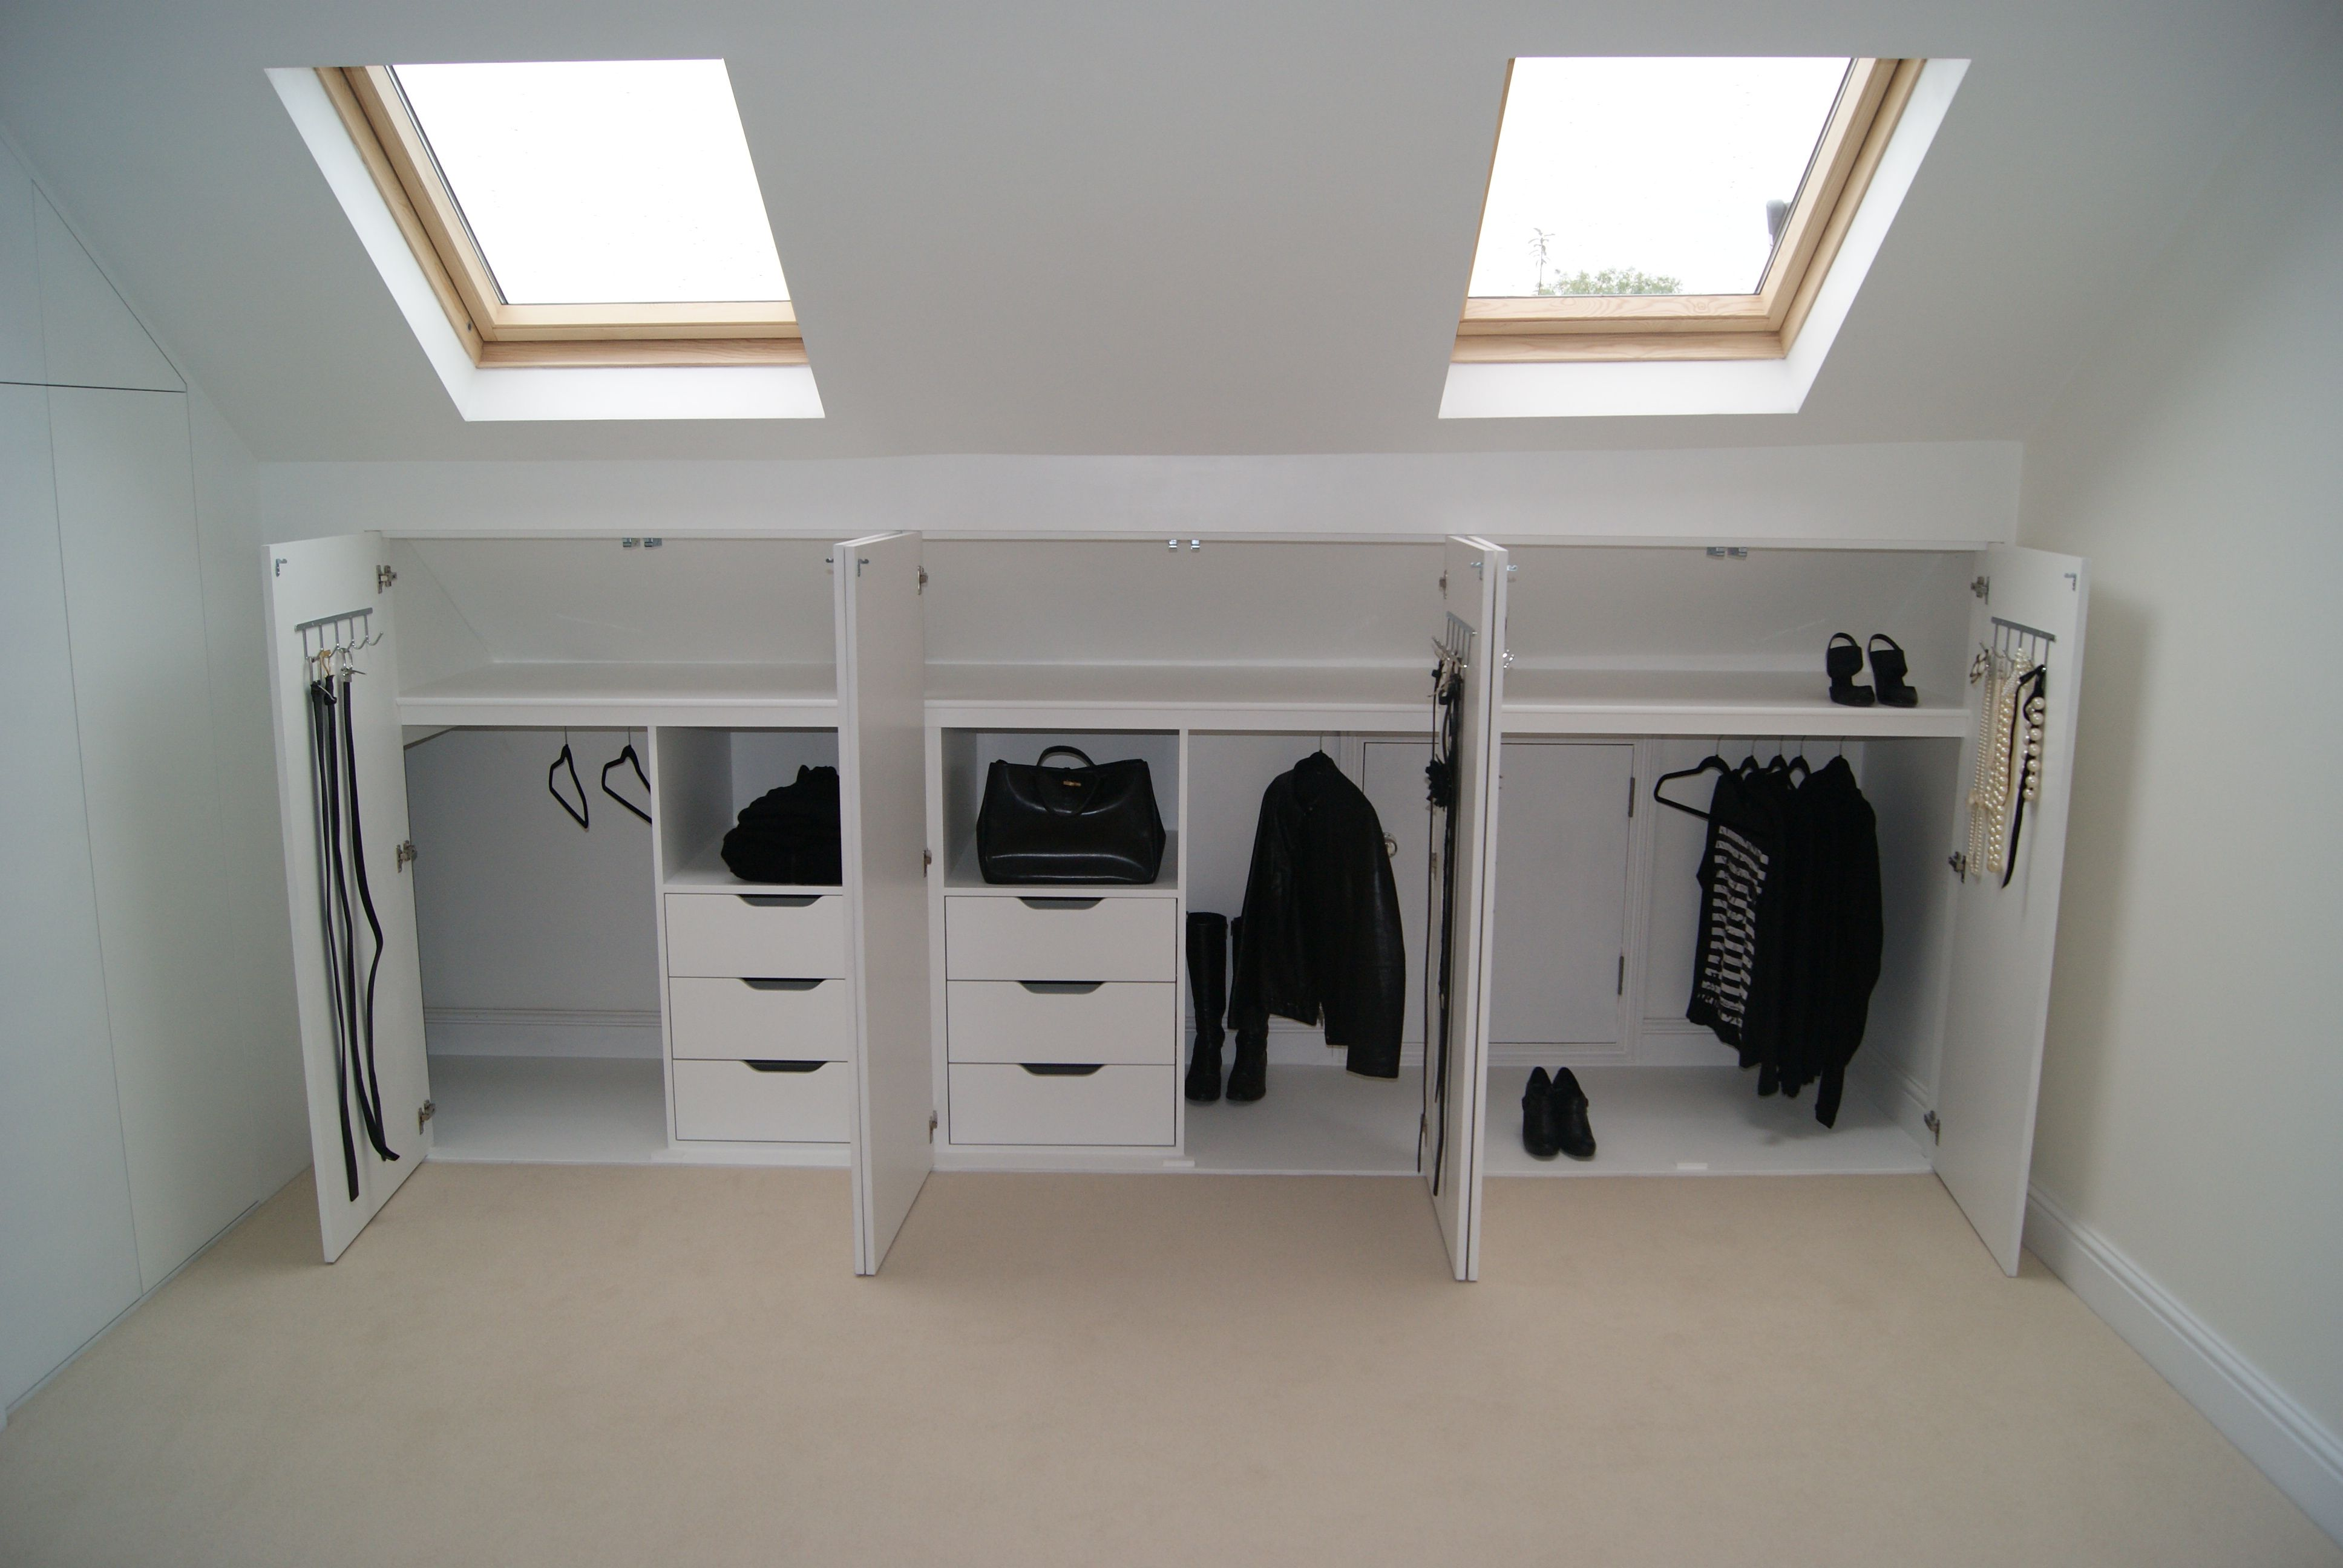 Loft bedroom with walk in wardrobe  wardrobe solutions for loft conversion  Google Search